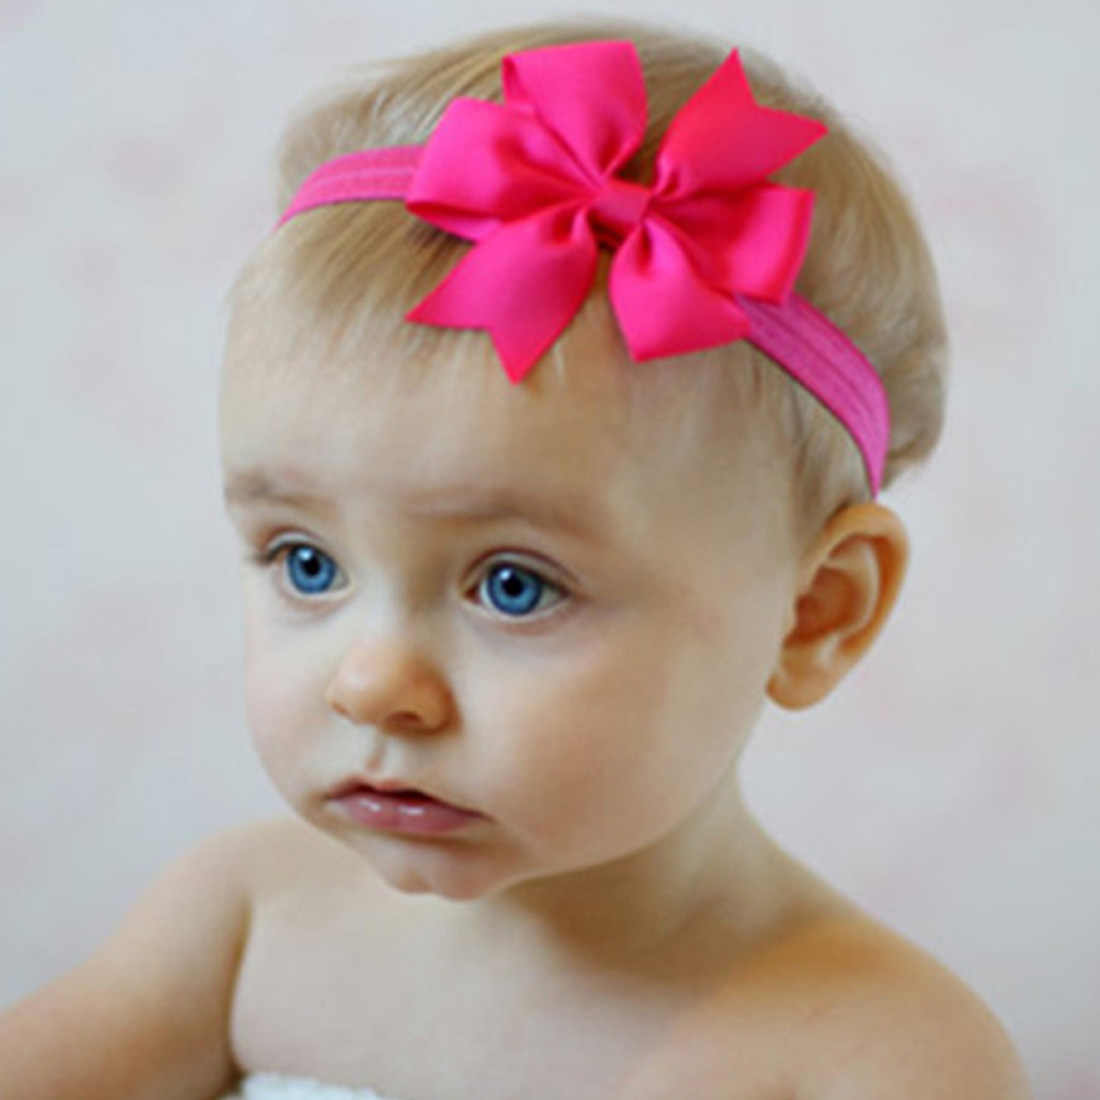 Headwrap เด็ก headbands headwear หญิง bow knot hairband head band ทารกแรกเกิดเด็กวัยหัดเดินของขวัญ tiara อุปกรณ์เสริมผม